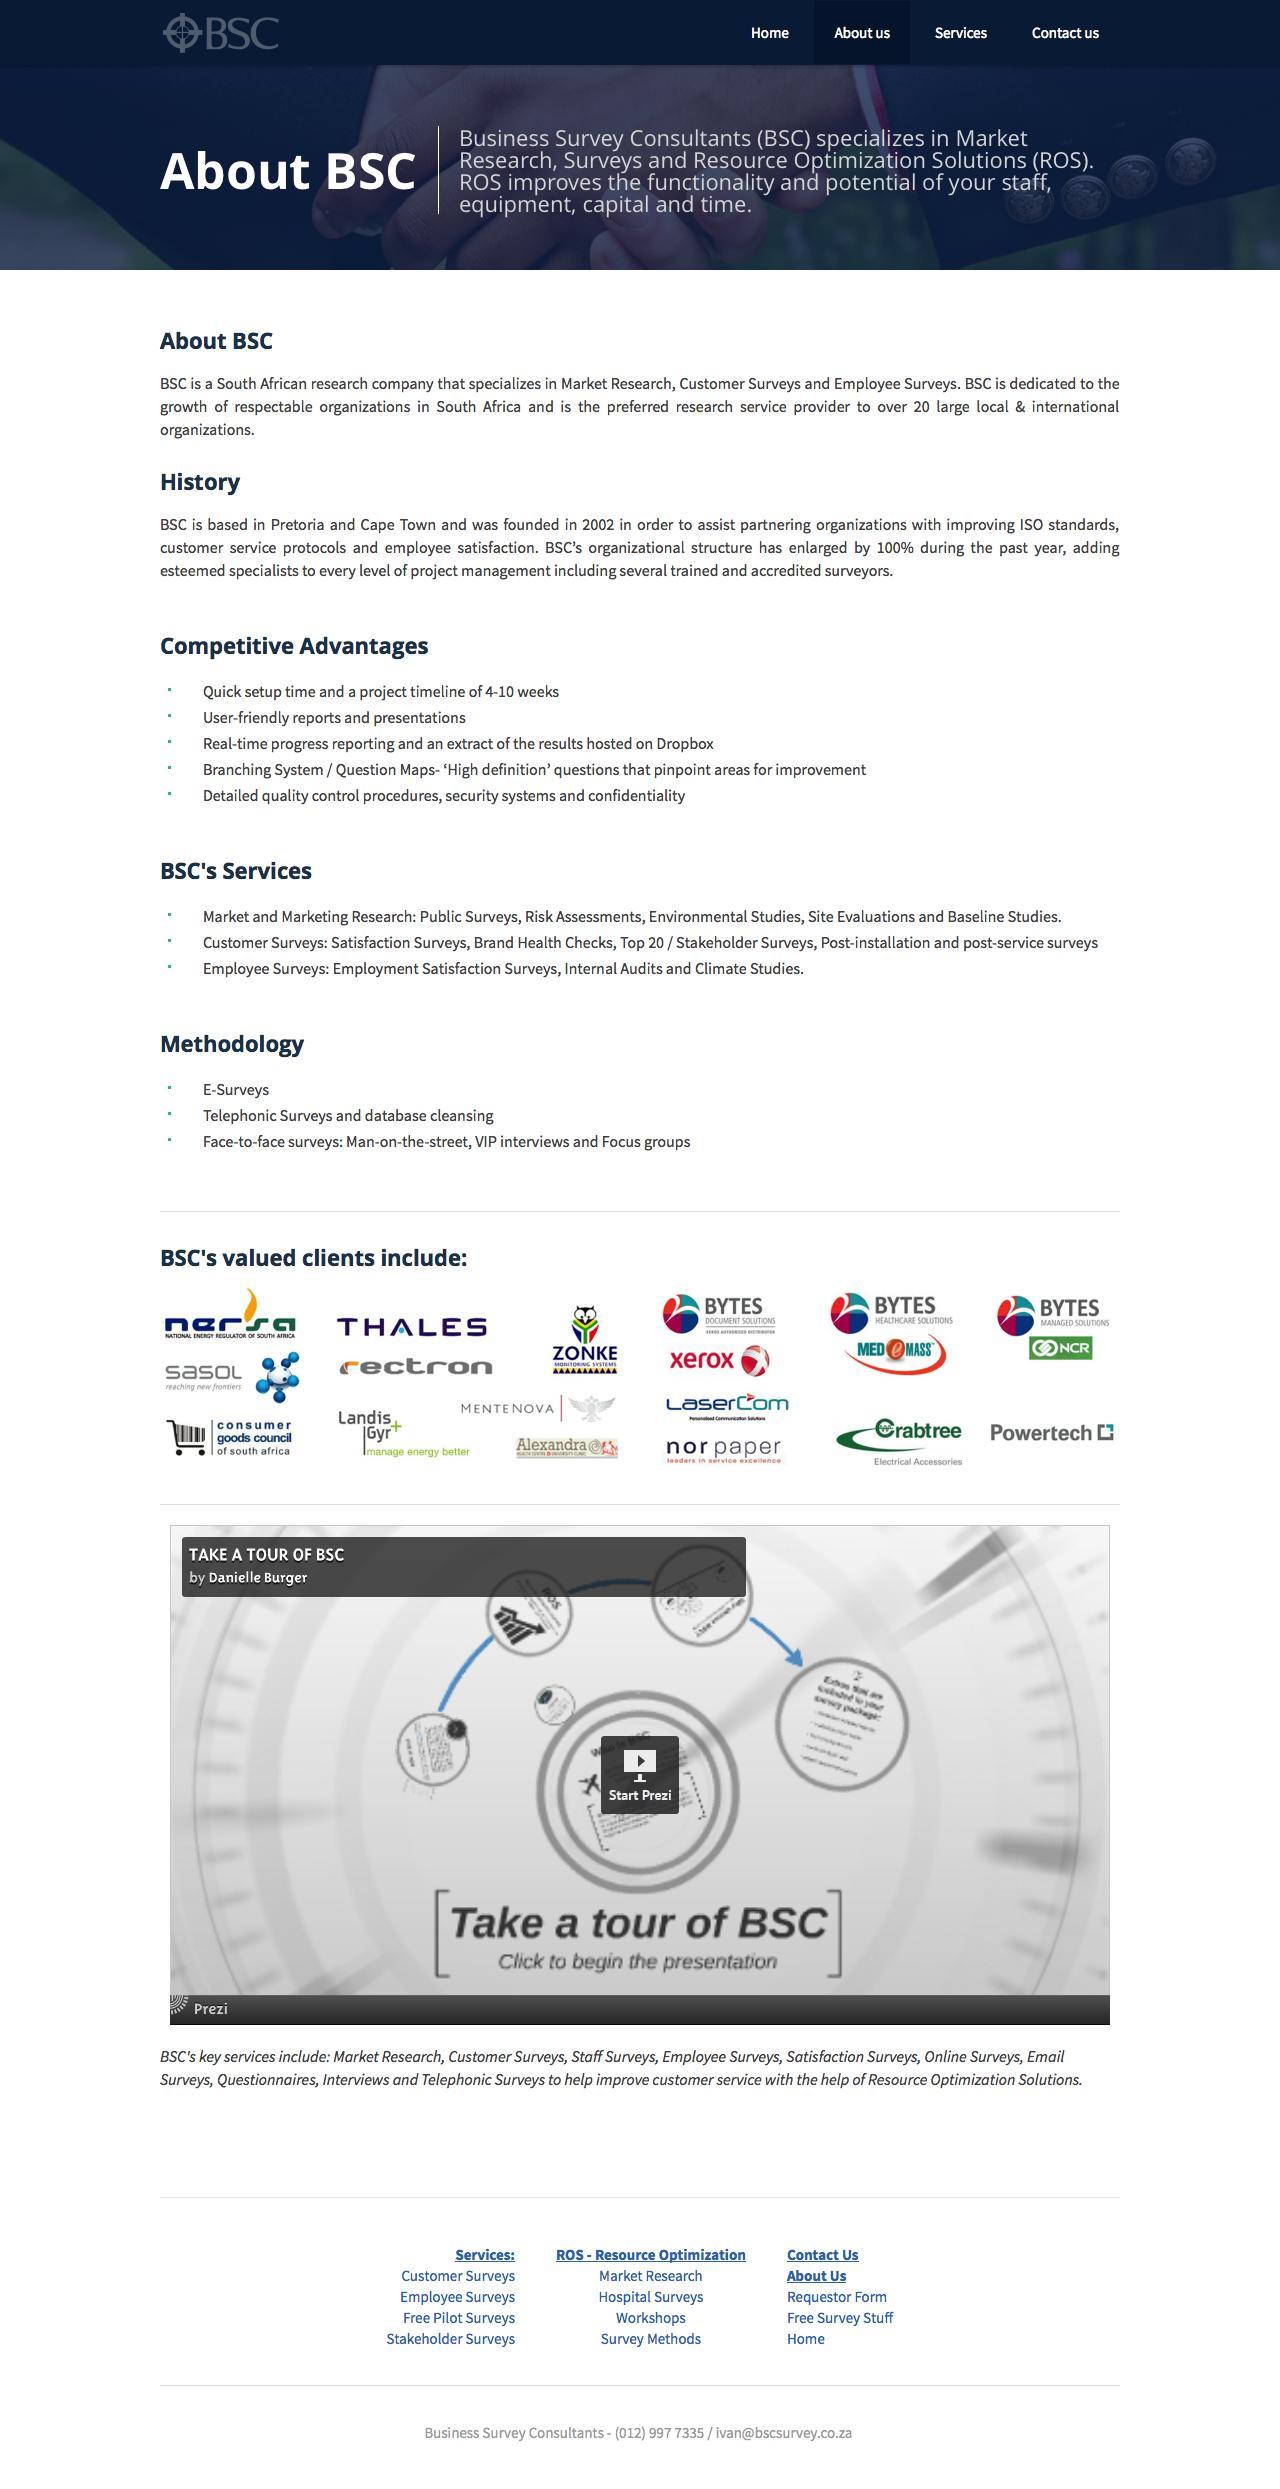 Screenshot of businesssurveyconsultants.com - About BSC - Business Survey Consultants - Business Survey Consultants - captured Oct. 5, 2014